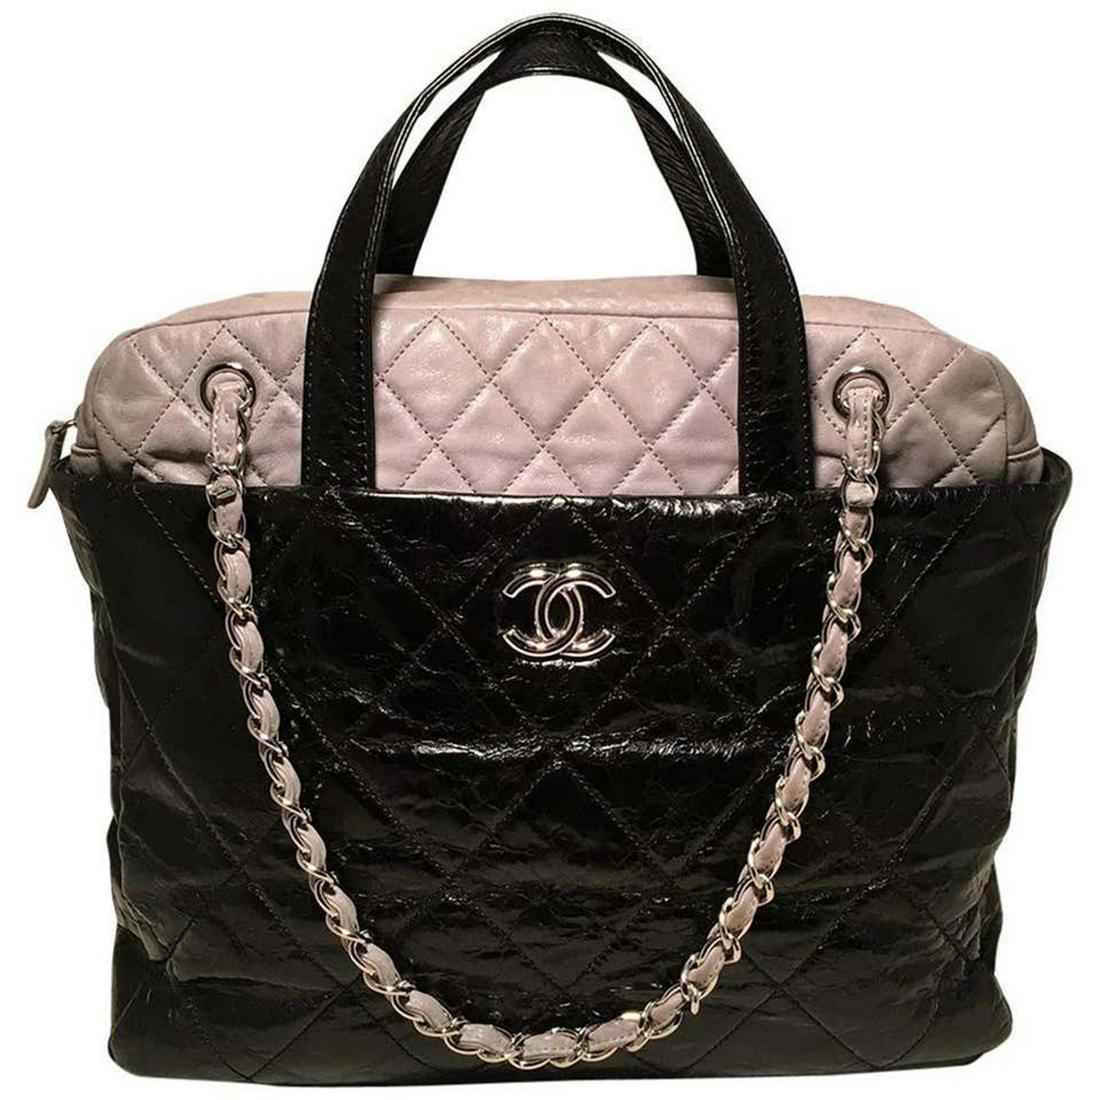 Chanel Black & Grey Quilted Leather Portobello Tote